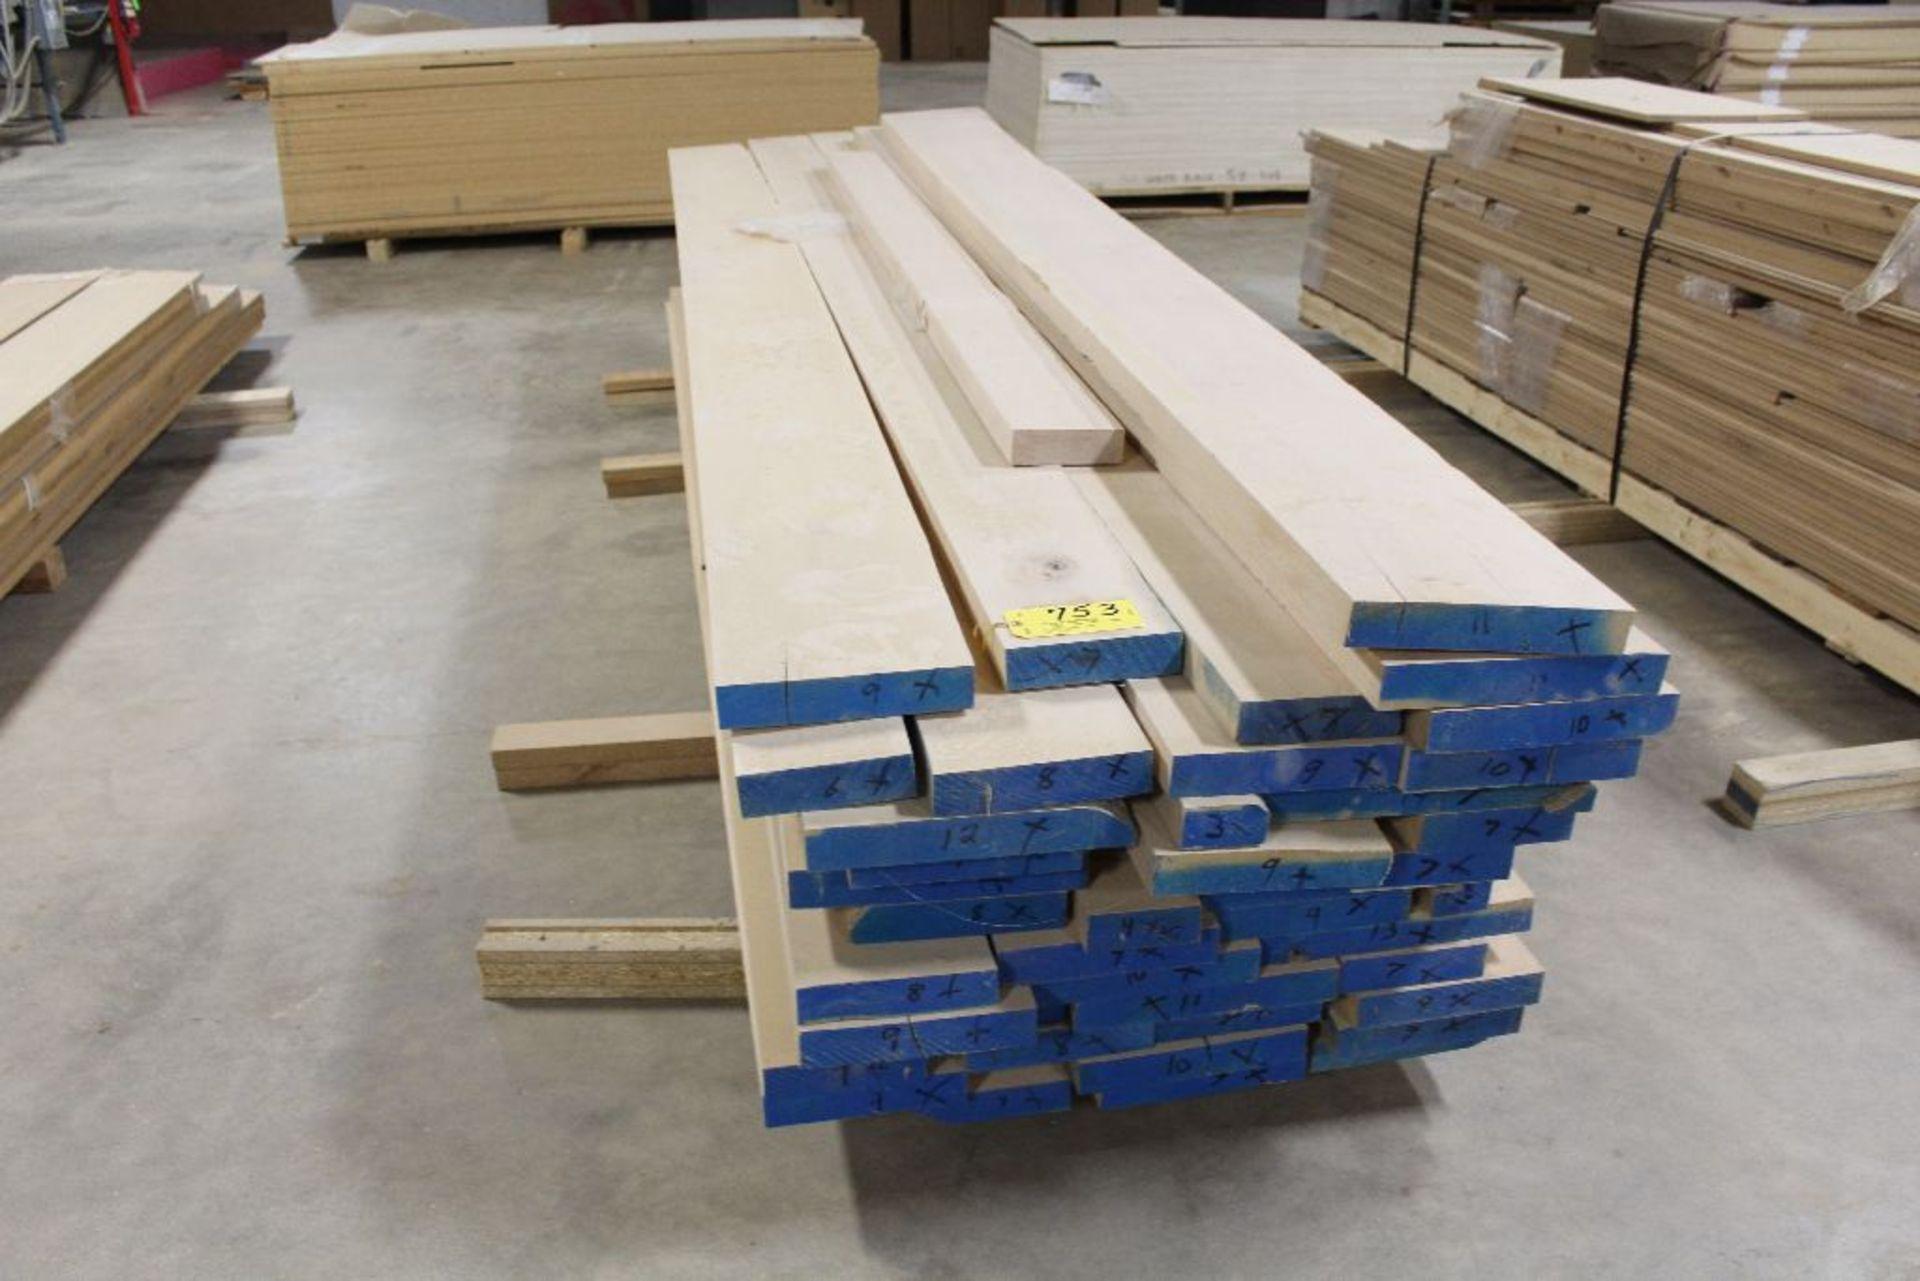 Lot 753 - Lumber, Poplar, 1 3/4 x 9', 10', 12' x 12'.